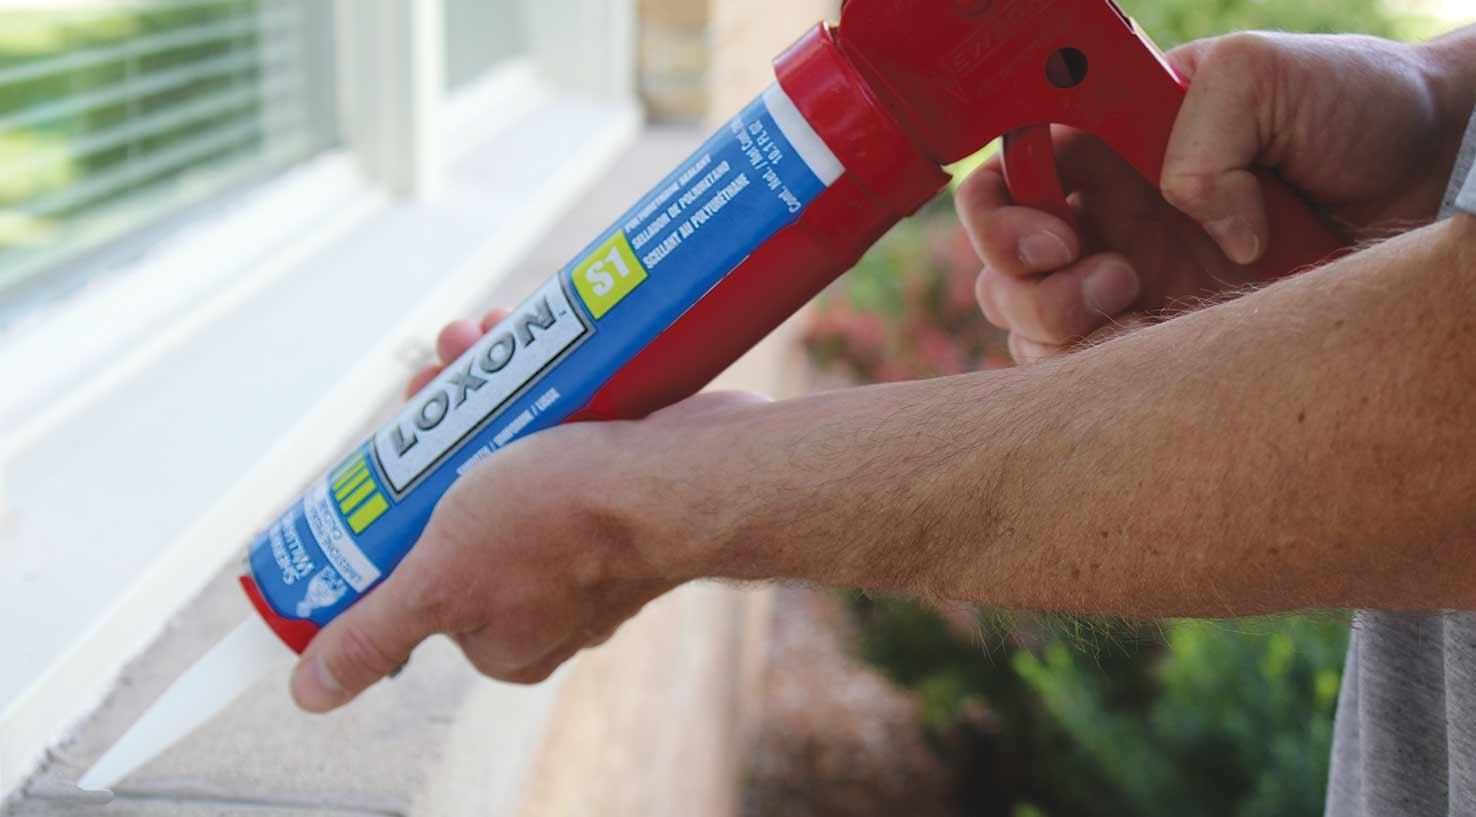 Loxon sealant being applied to exterior masonry windowframe